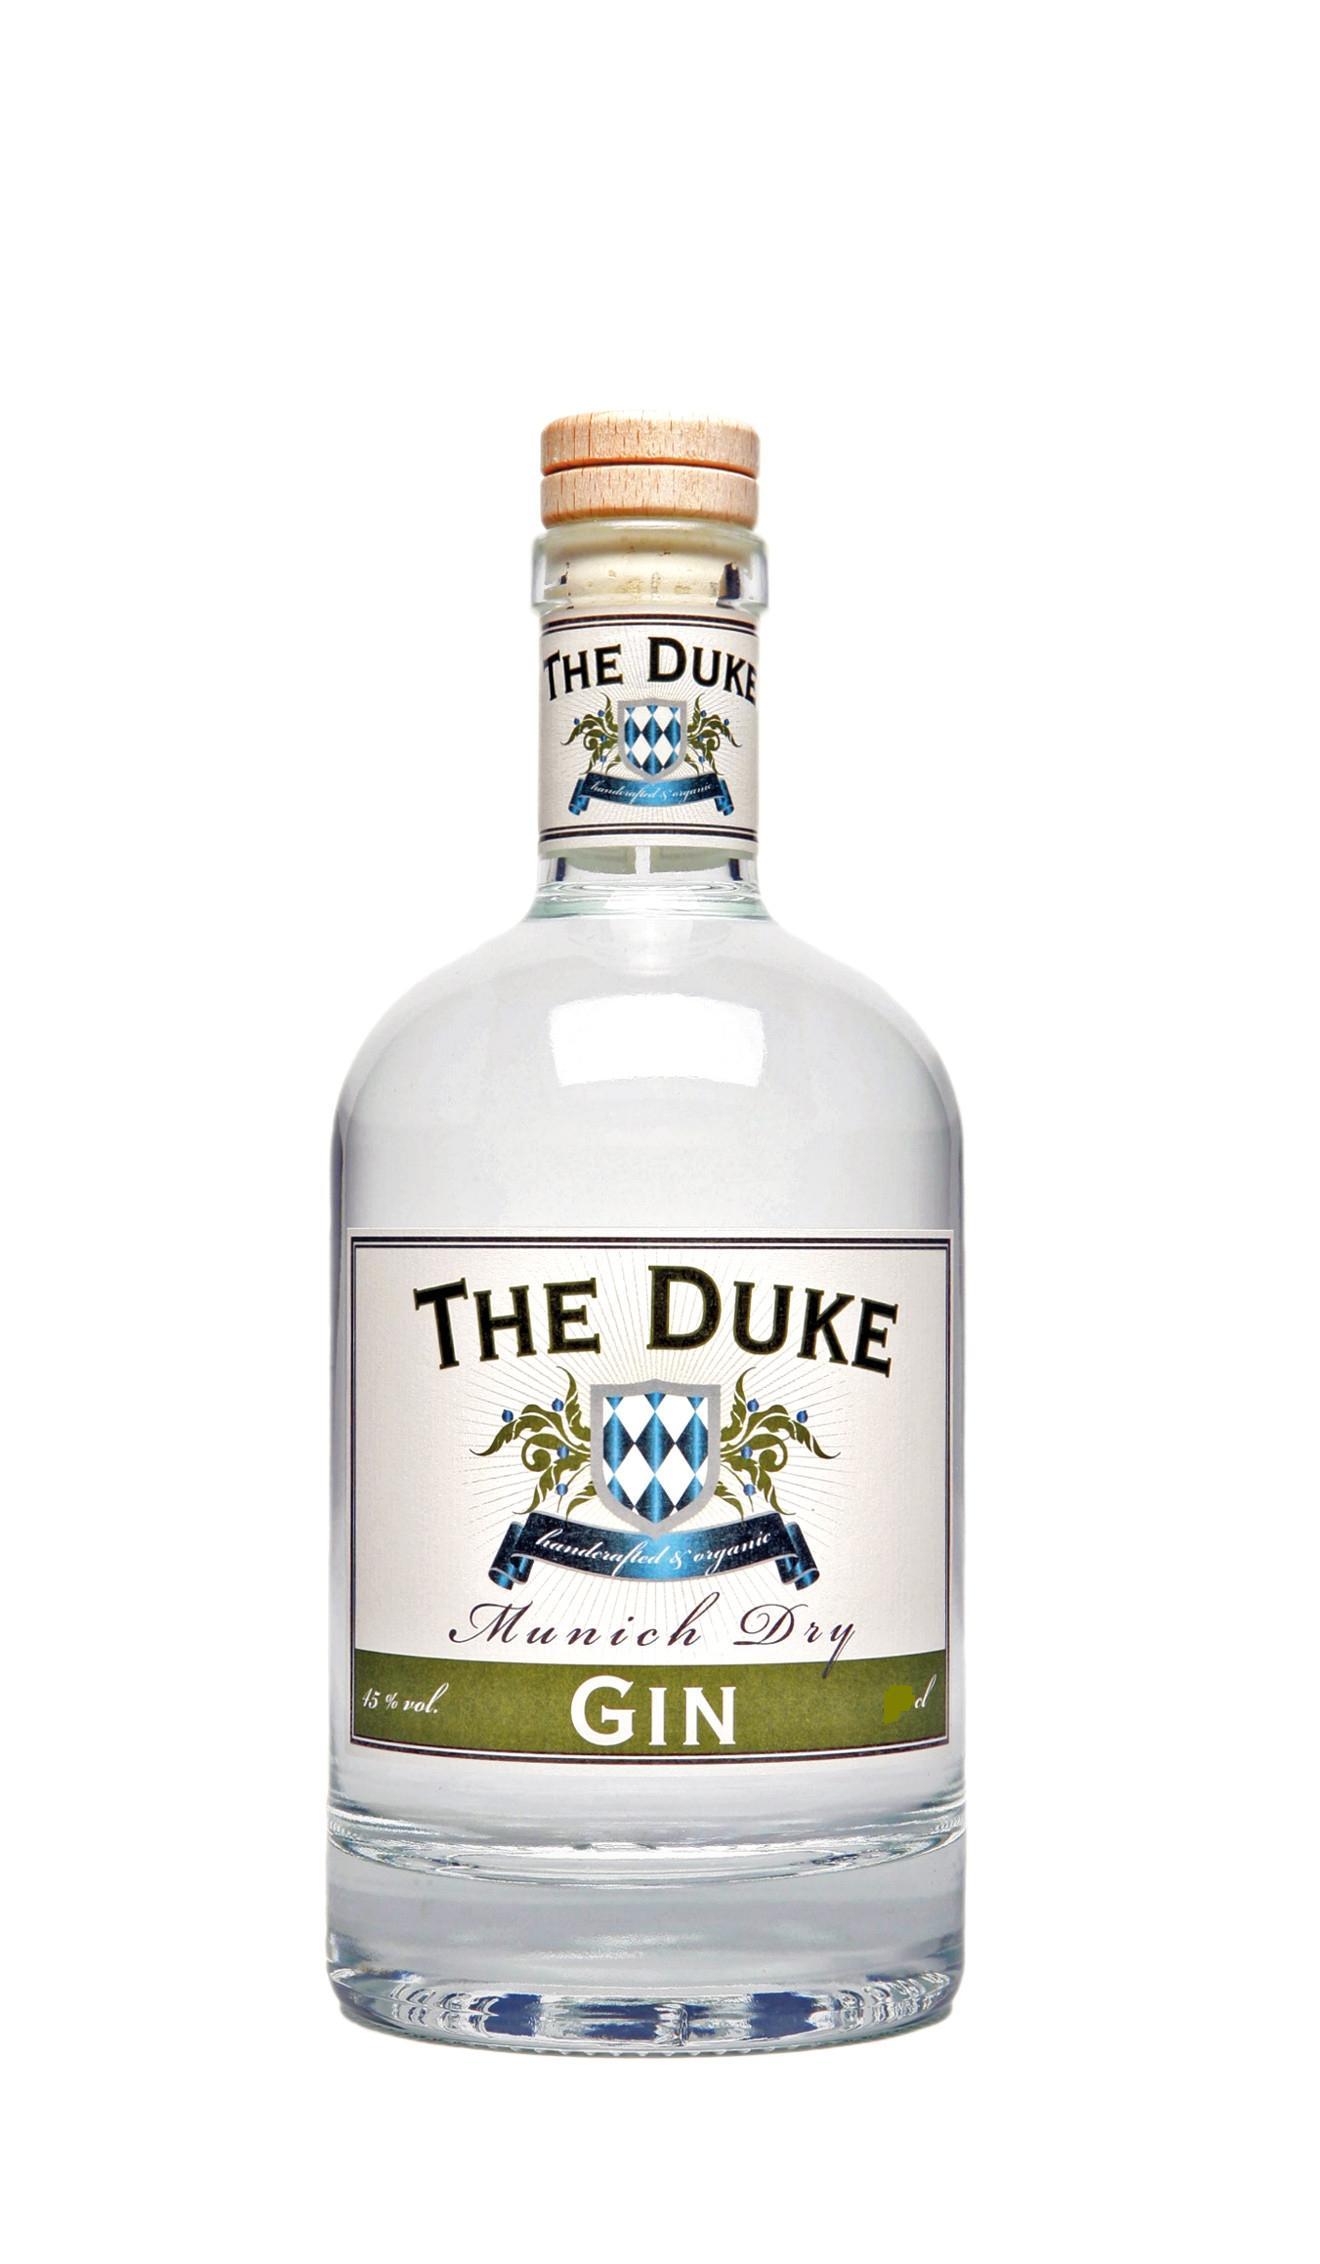 The Duke Munich Dry Gin 100ml